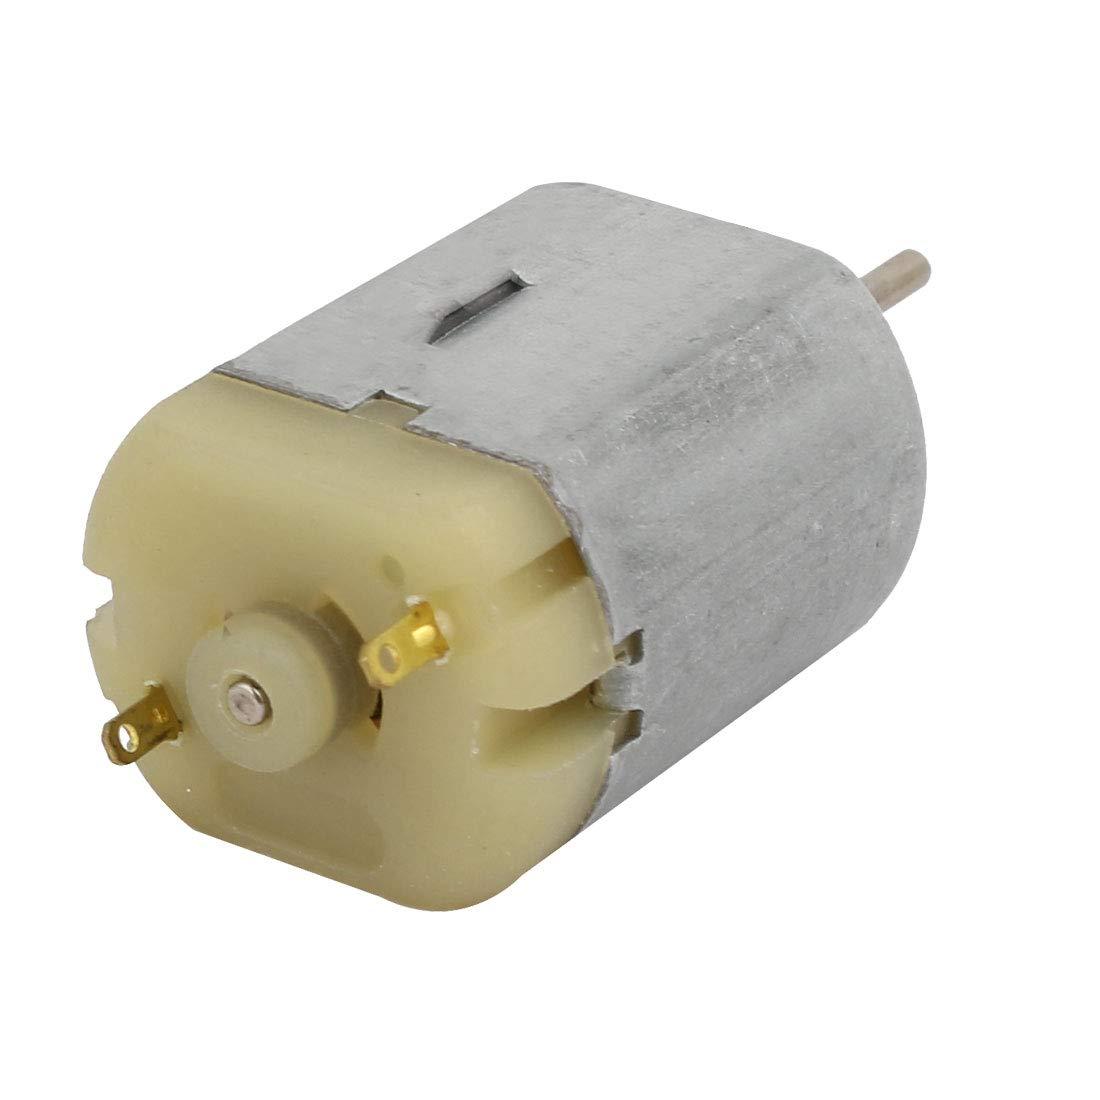 sourcing map DC 12V 2600RPM Mini Micro Motor para DIY Modelo RC coche el/éctrico